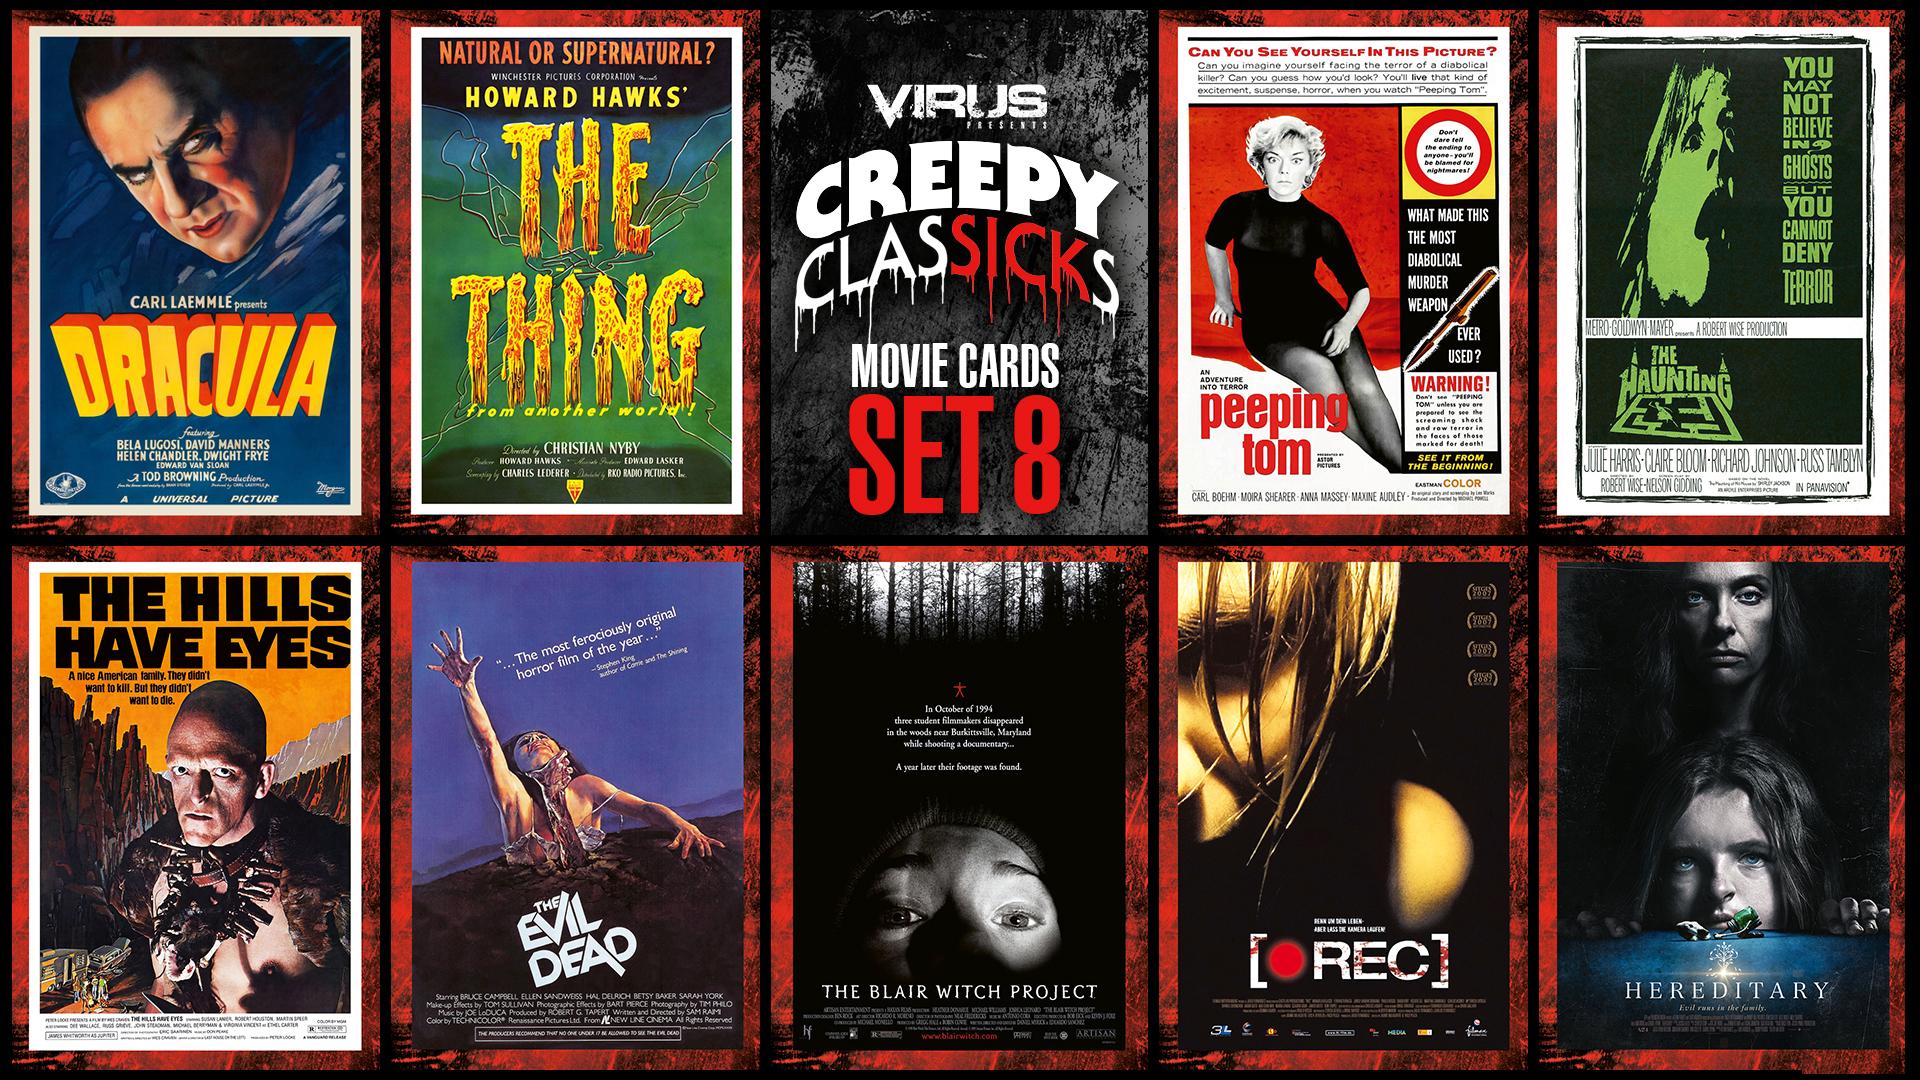 VIRUS Creepy ClasSICKs Movie Cards Set #08